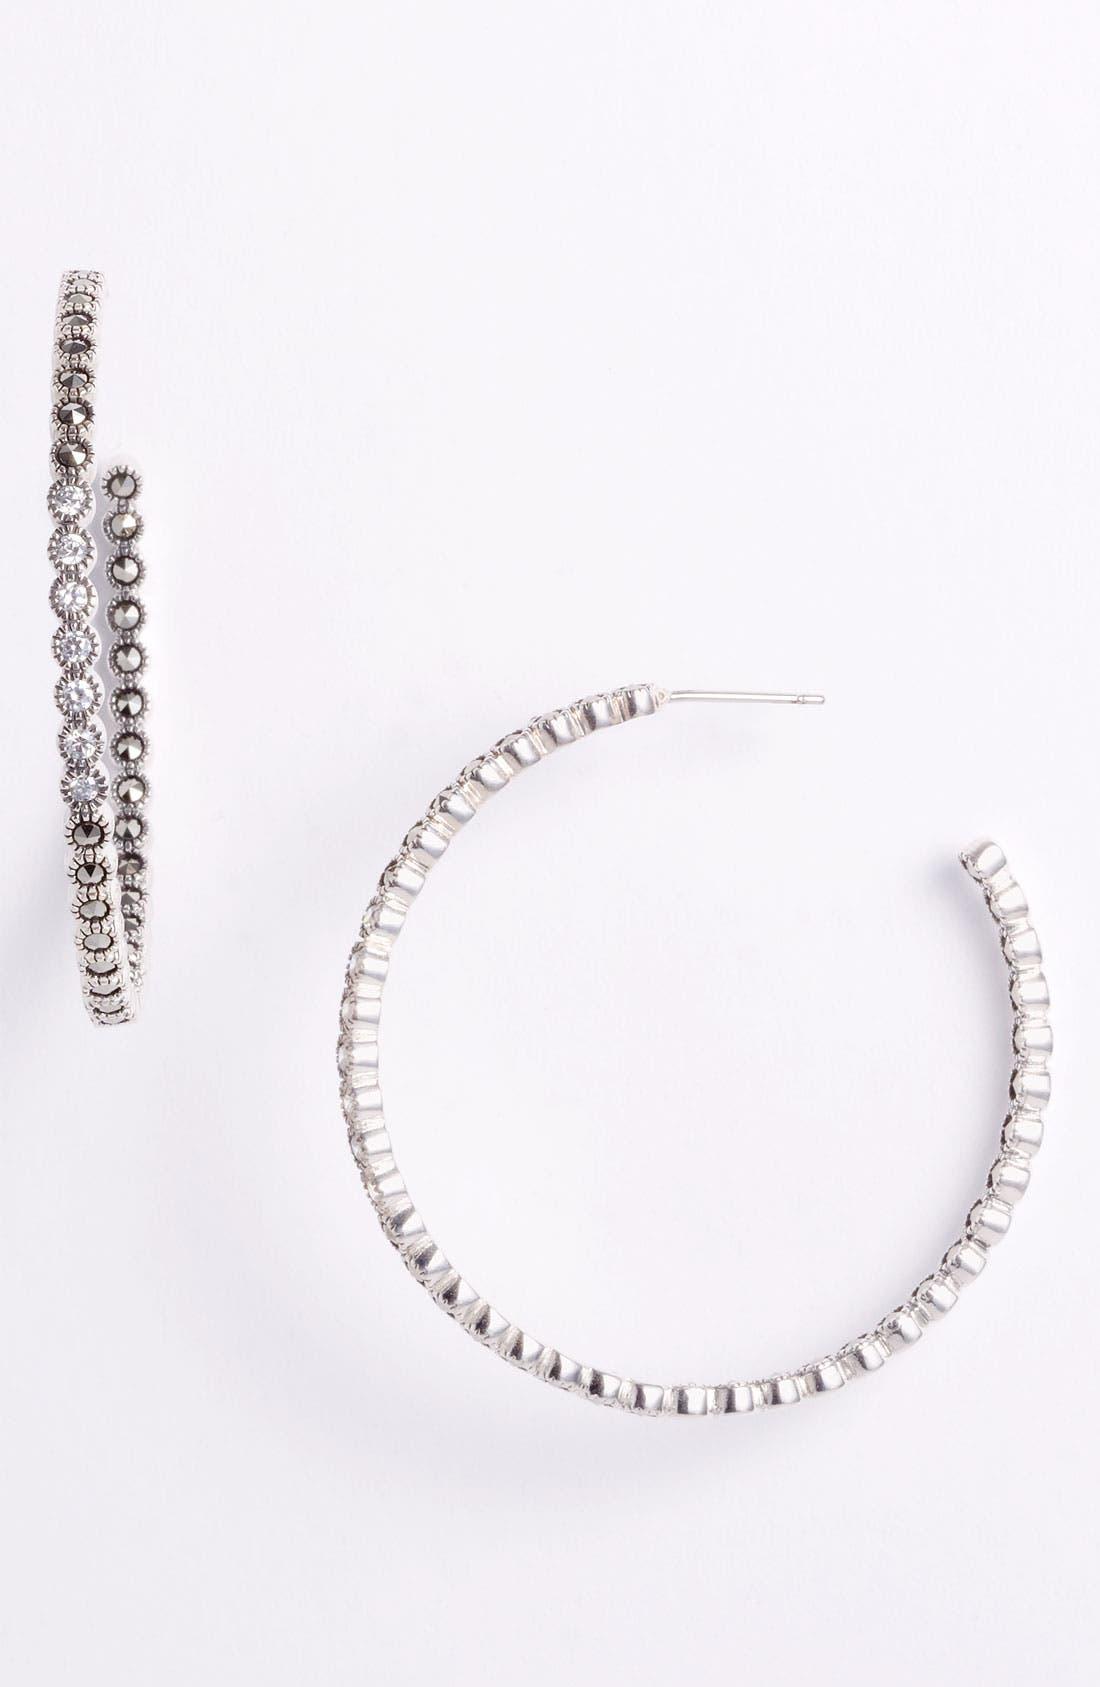 Main Image - Judith Jack 'Starlight' Inside Out Hoop Earrings